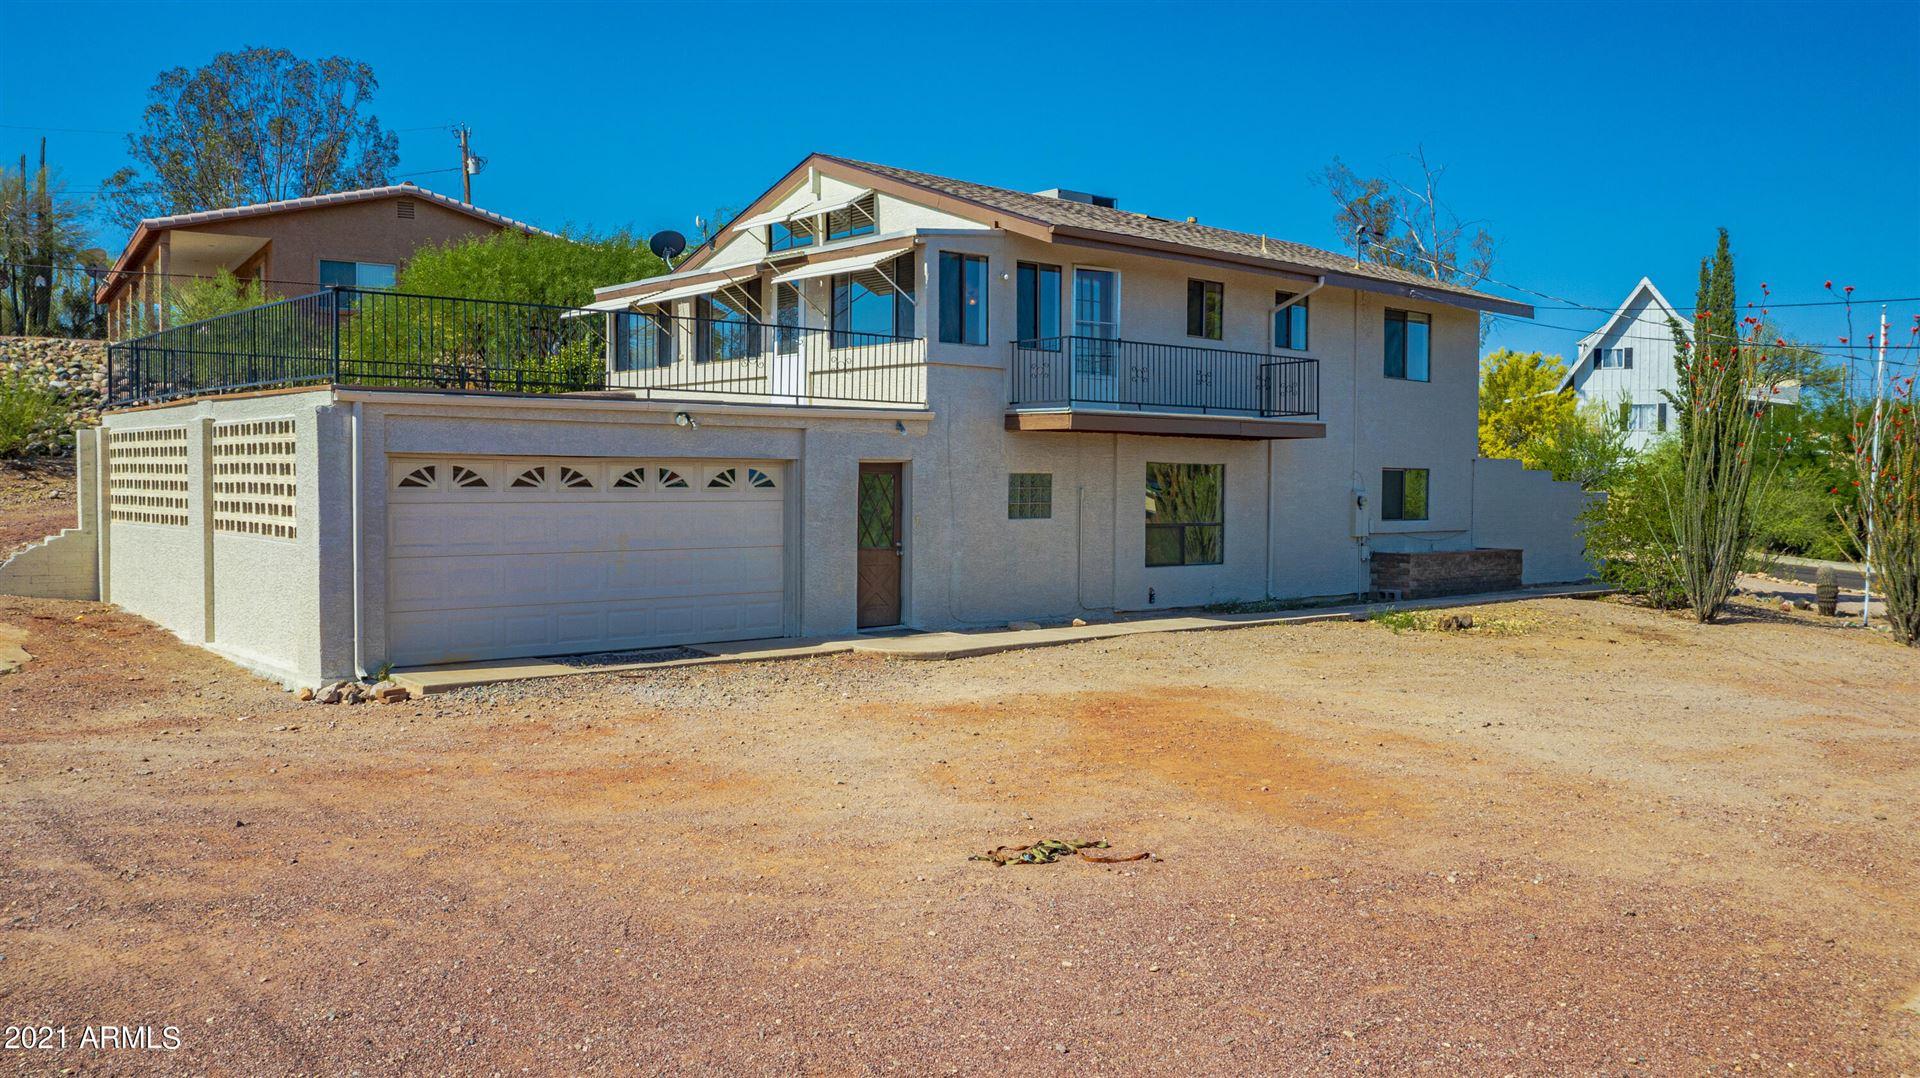 820 YAQUI Drive, Wickenburg, AZ 85390 - MLS#: 6234126